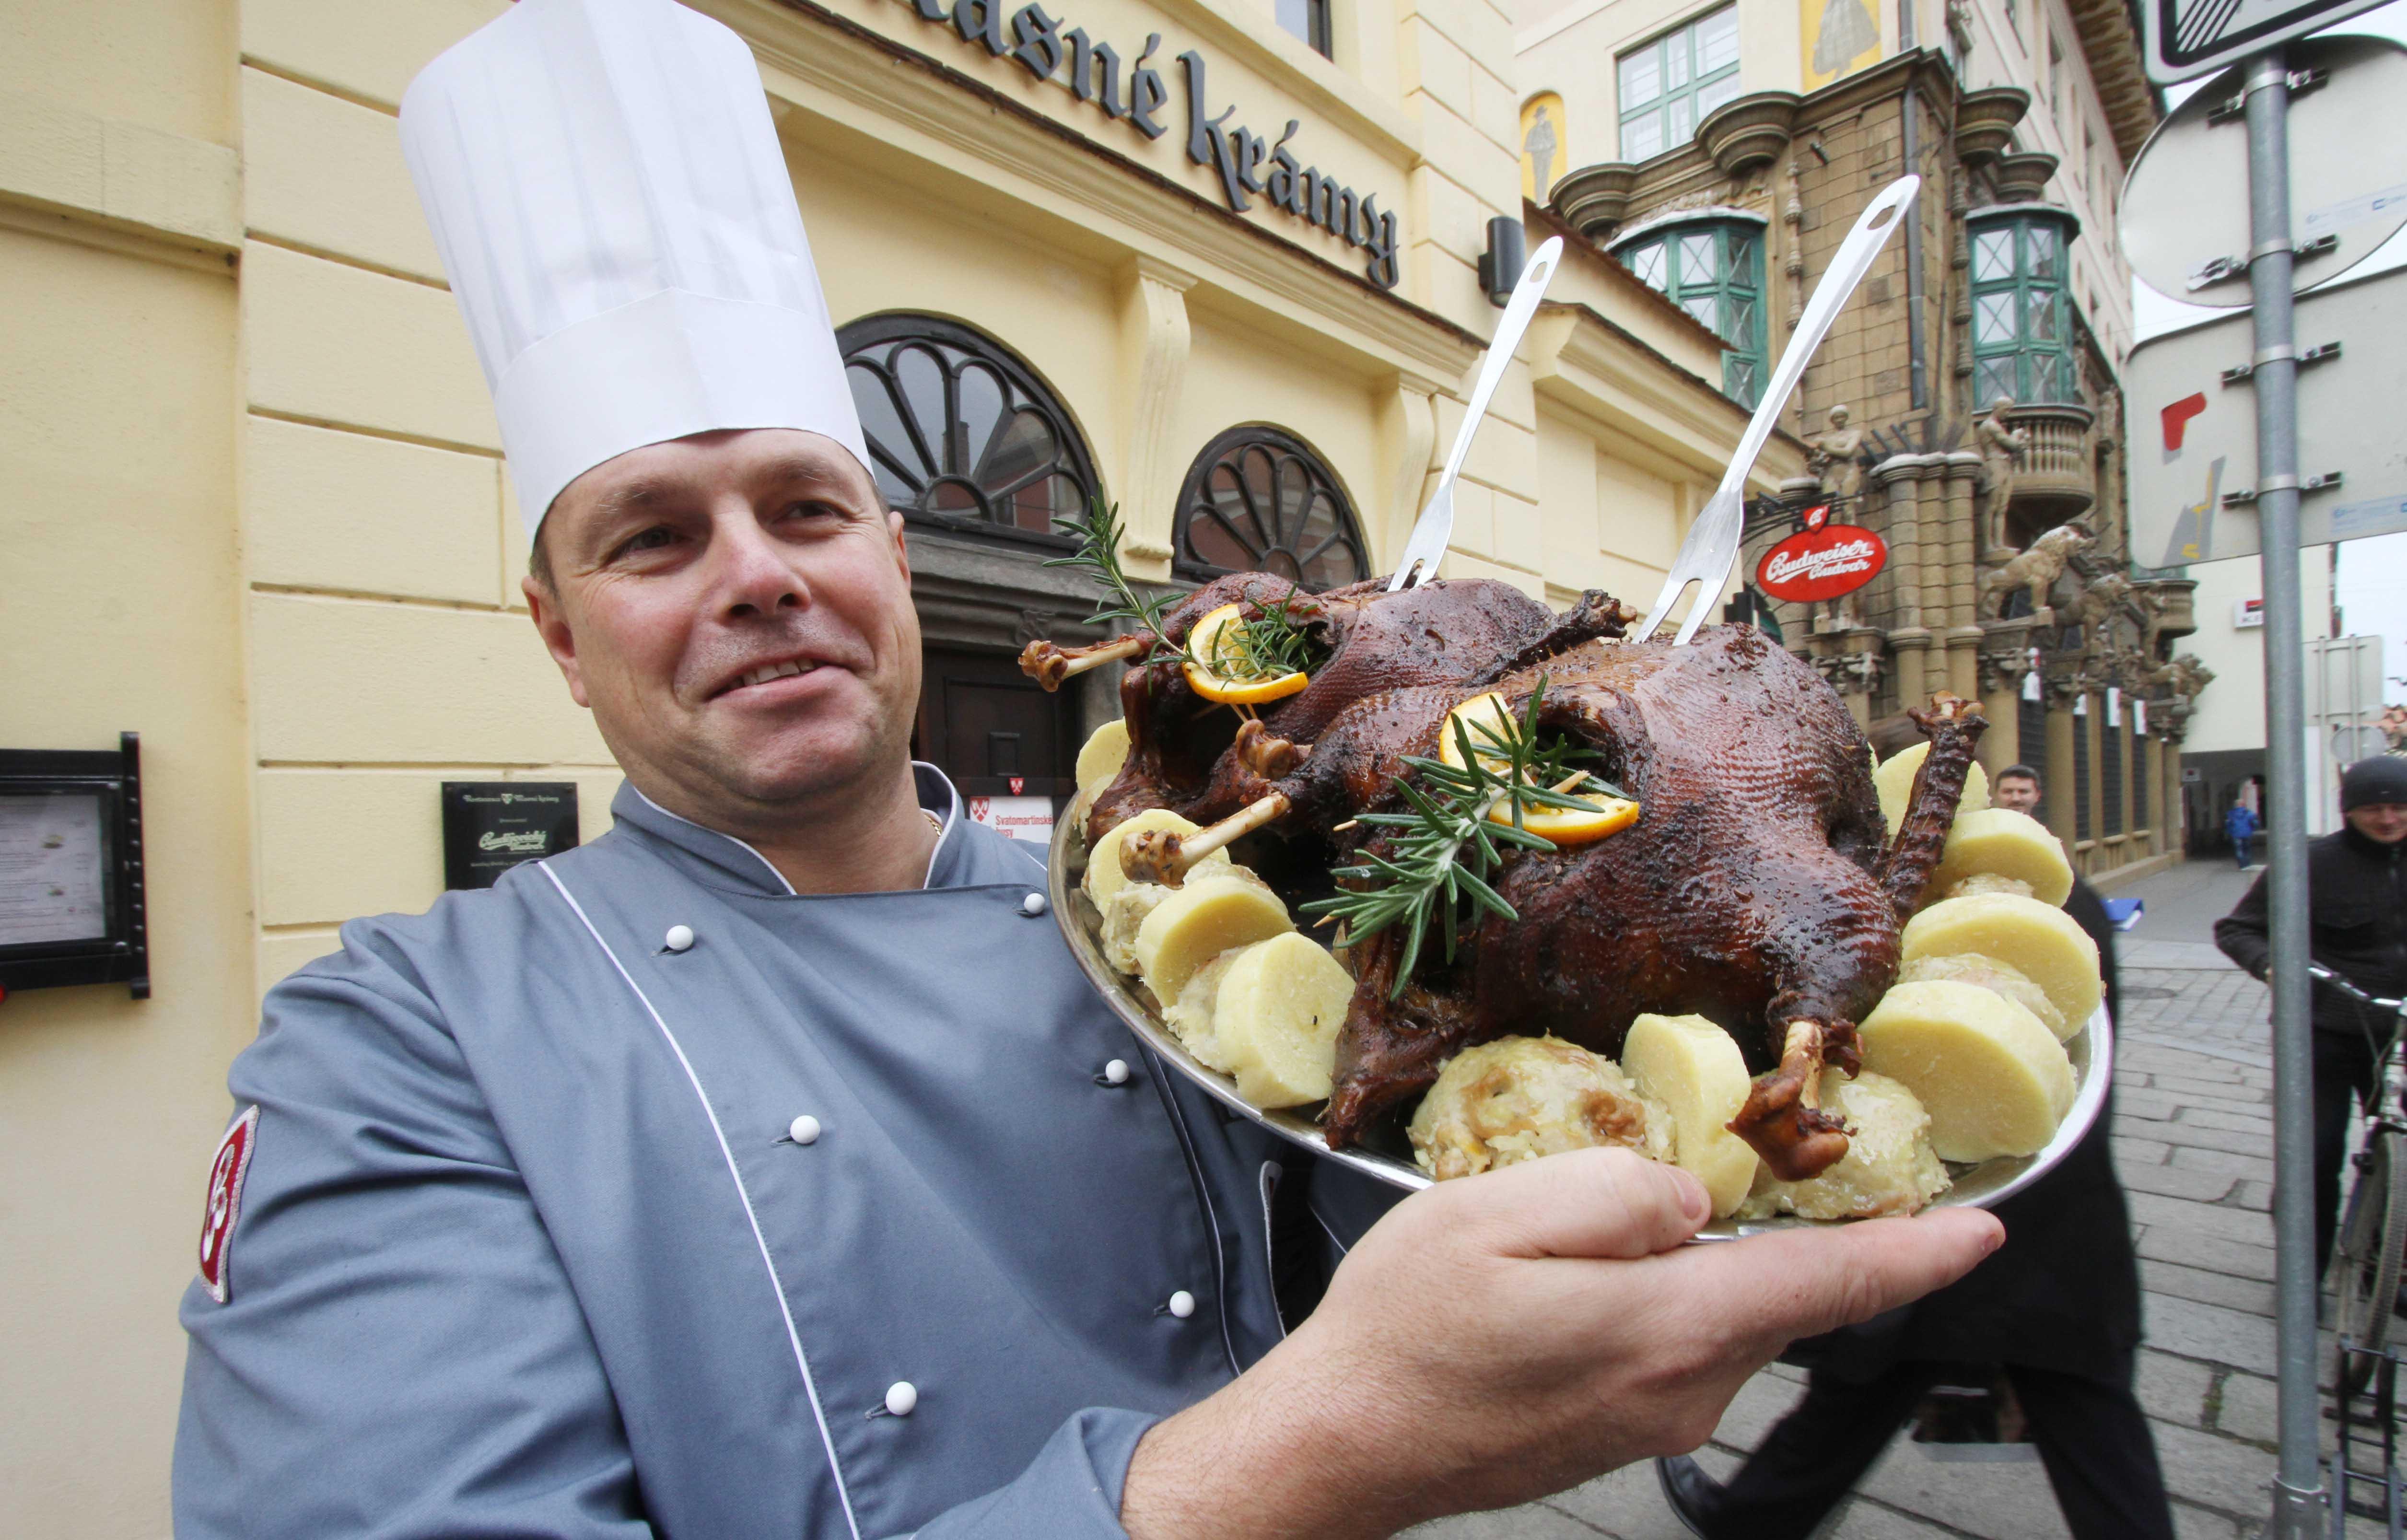 Šéfkuchař restaurace Masné krámy Luděk Hauser